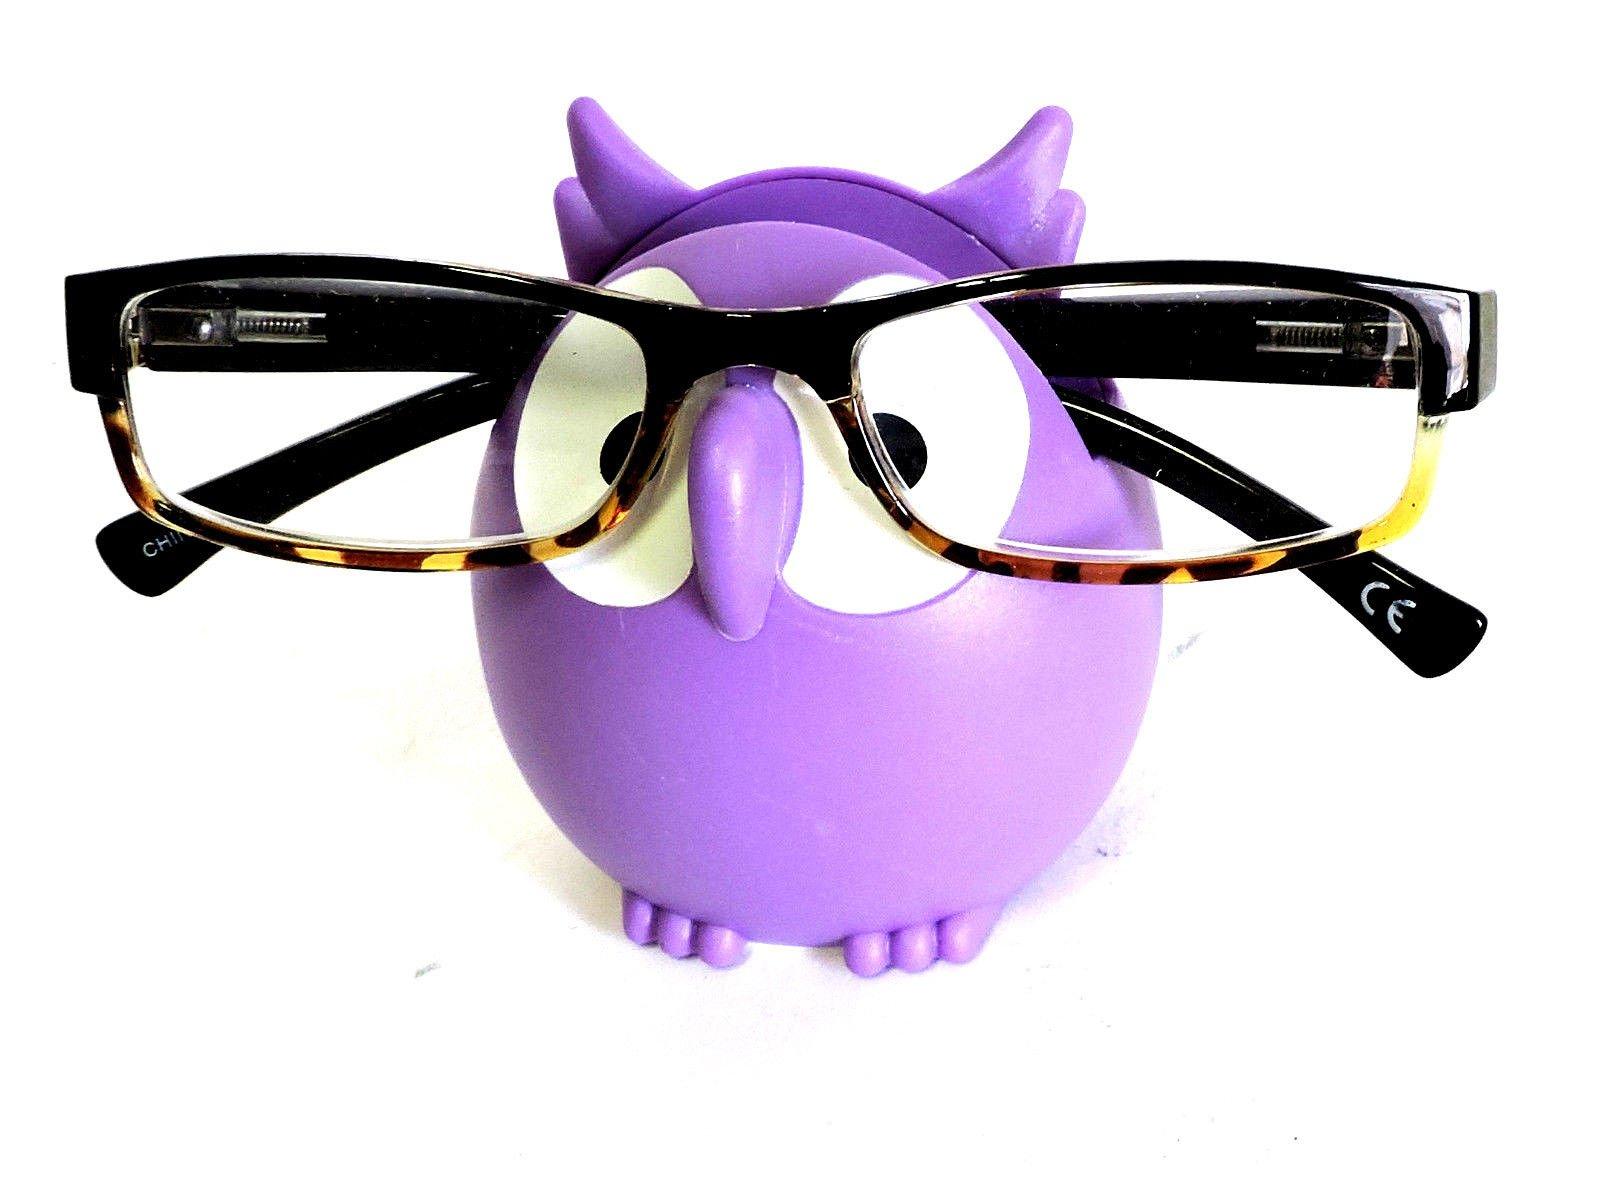 Owl Glasses Sunglasses Eyeglass Holder Stand Smartphone